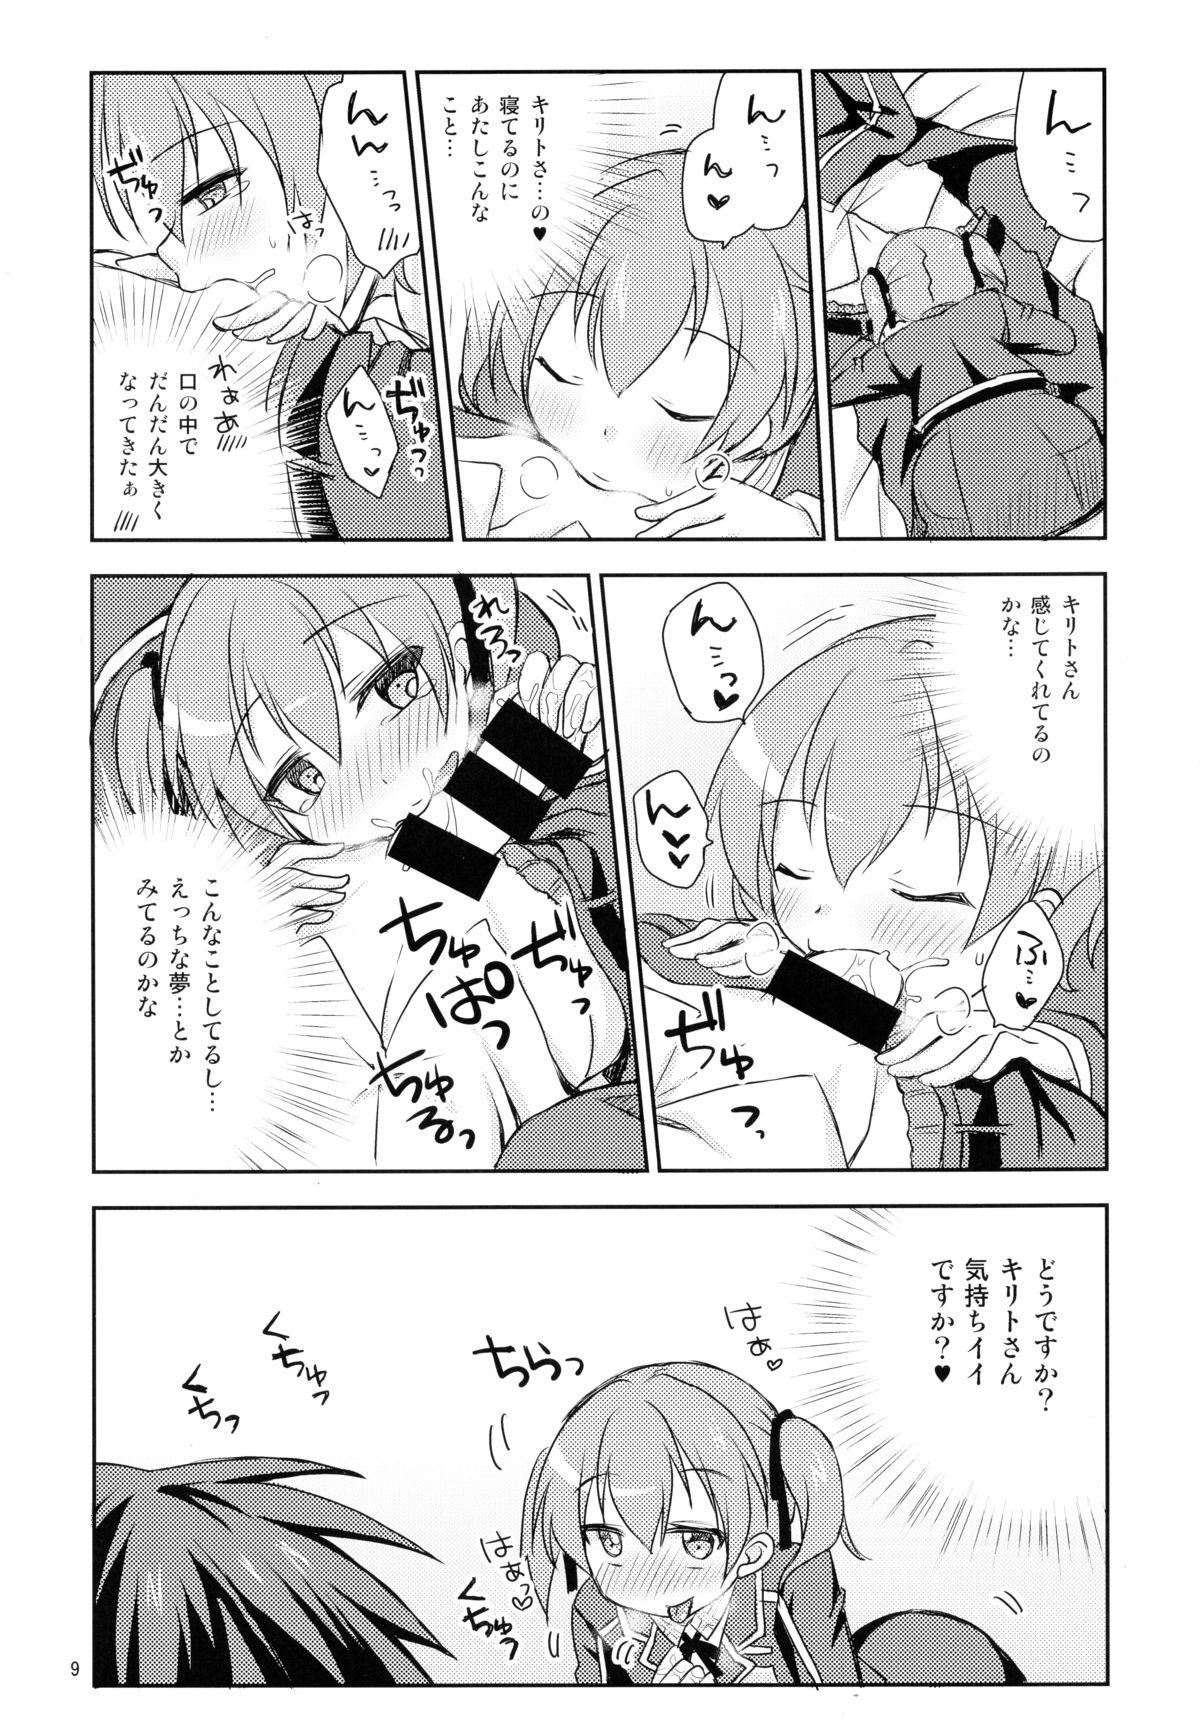 Itazura Silica-chan 8